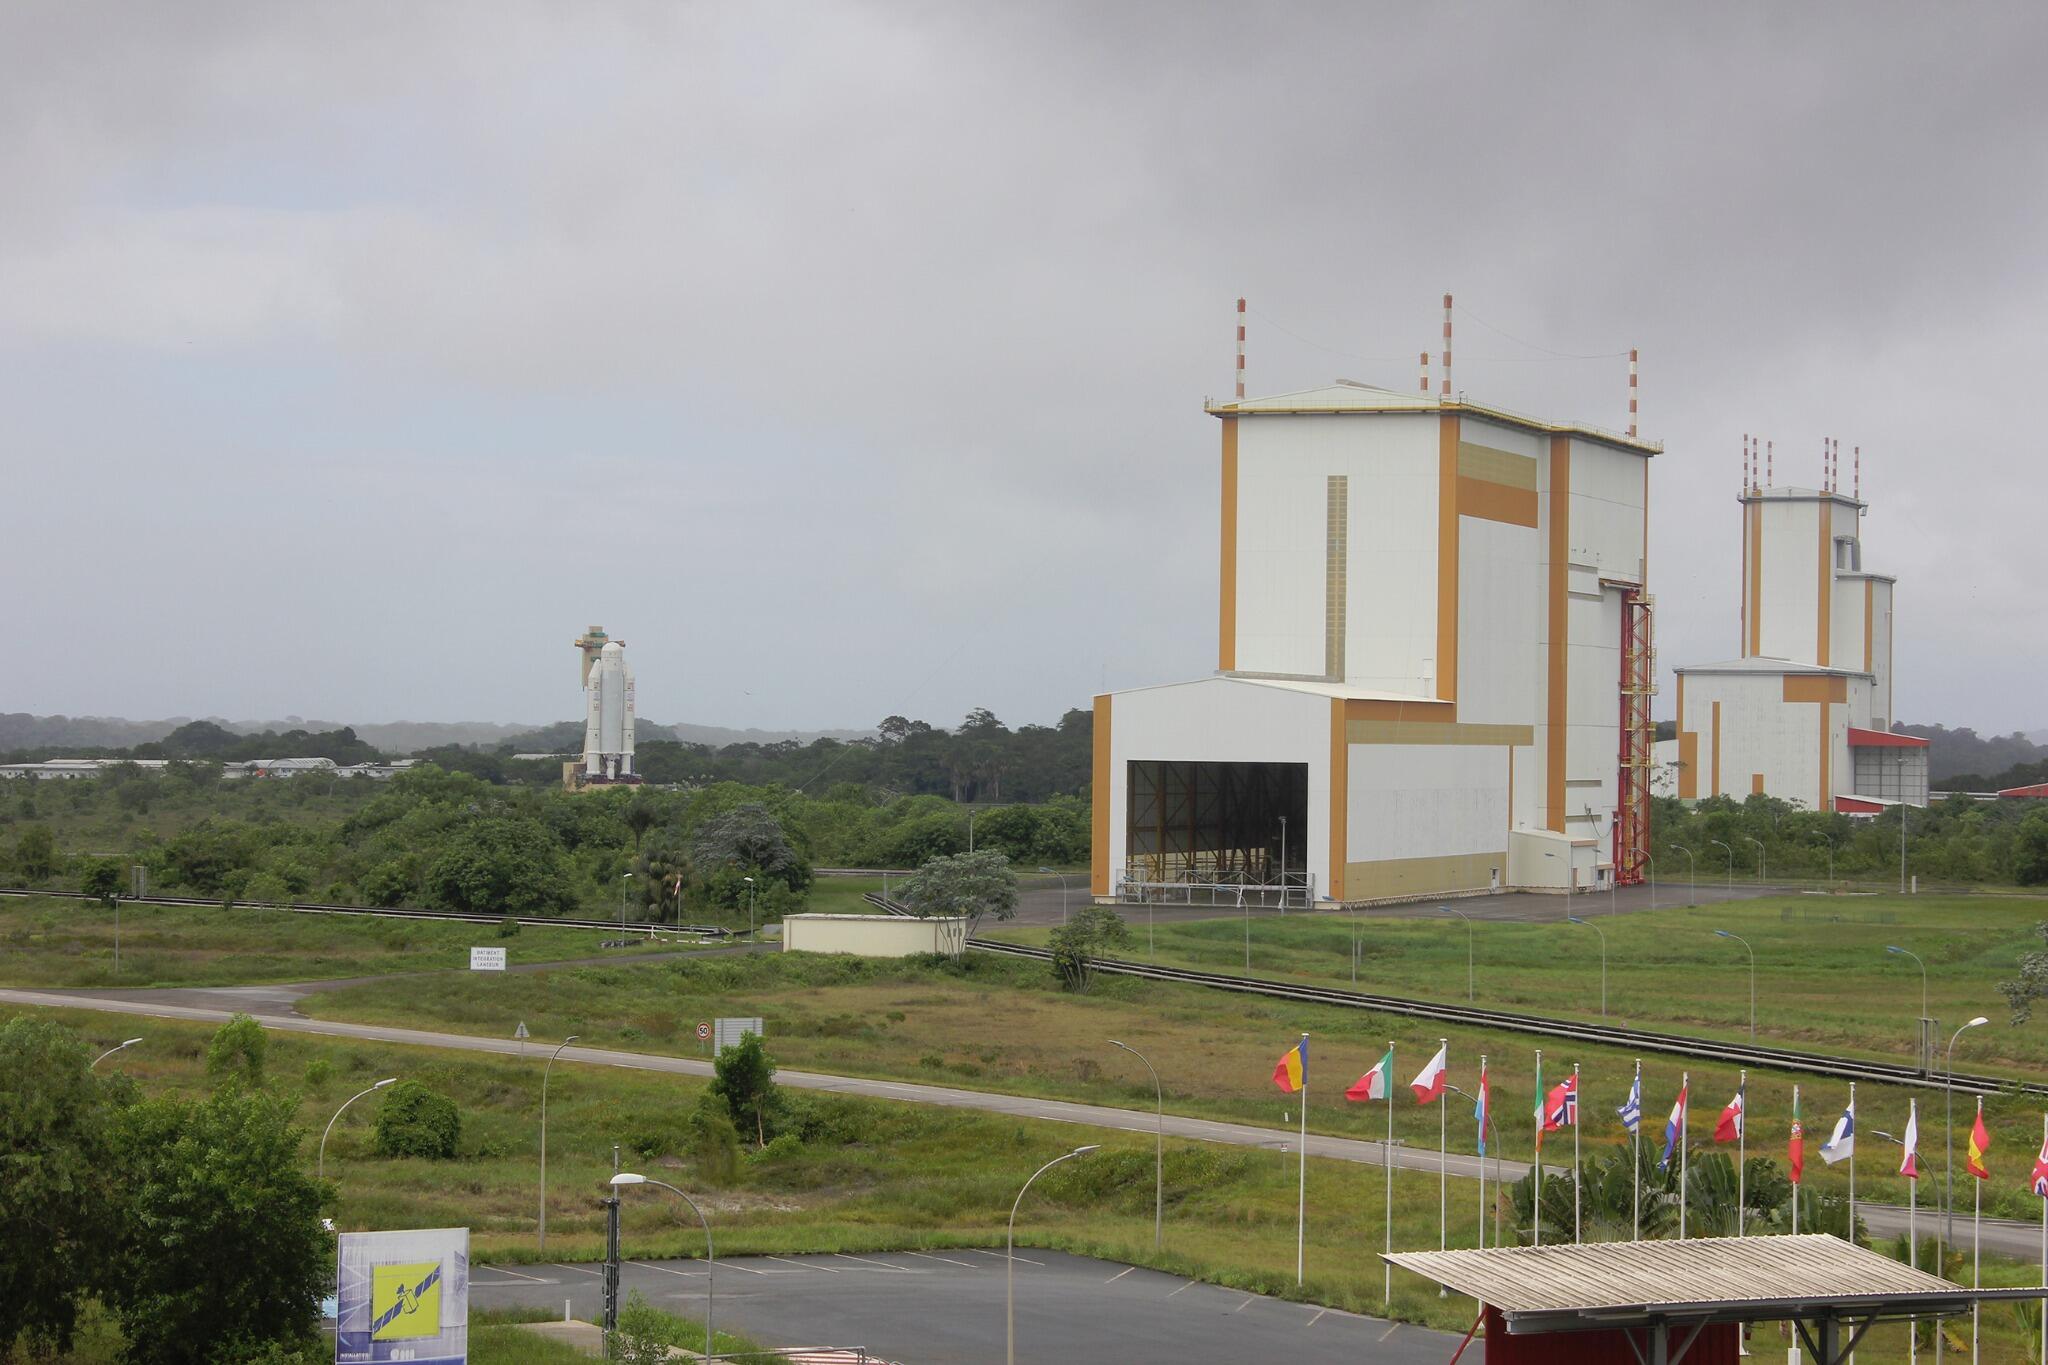 Lancement Ariane 5 ECA VA218 / Measat 3B + Optus 10  - 11 septembre 2014 - Page 4 BpZkkTyIgAIQWMA